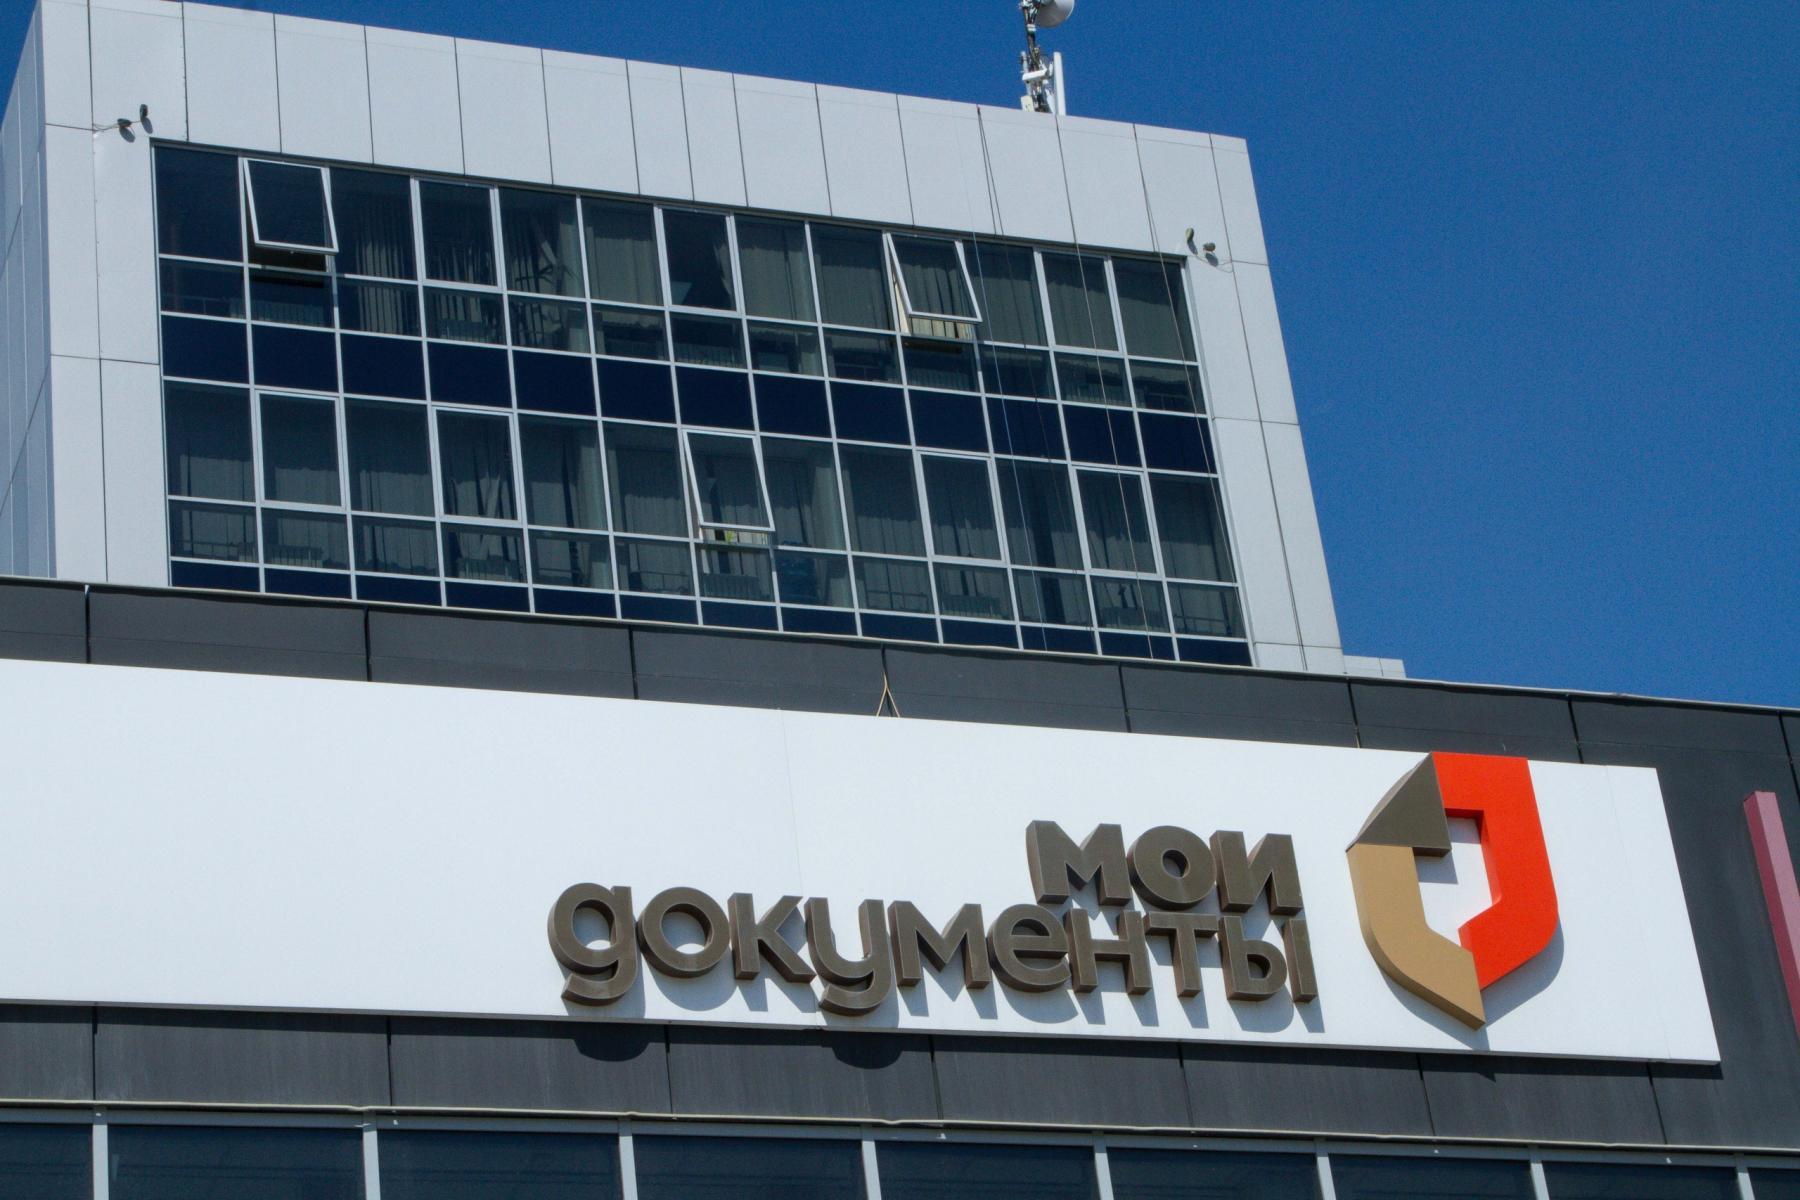 фото Коронавирус в Новосибирске: ситуация к 24 июня 4